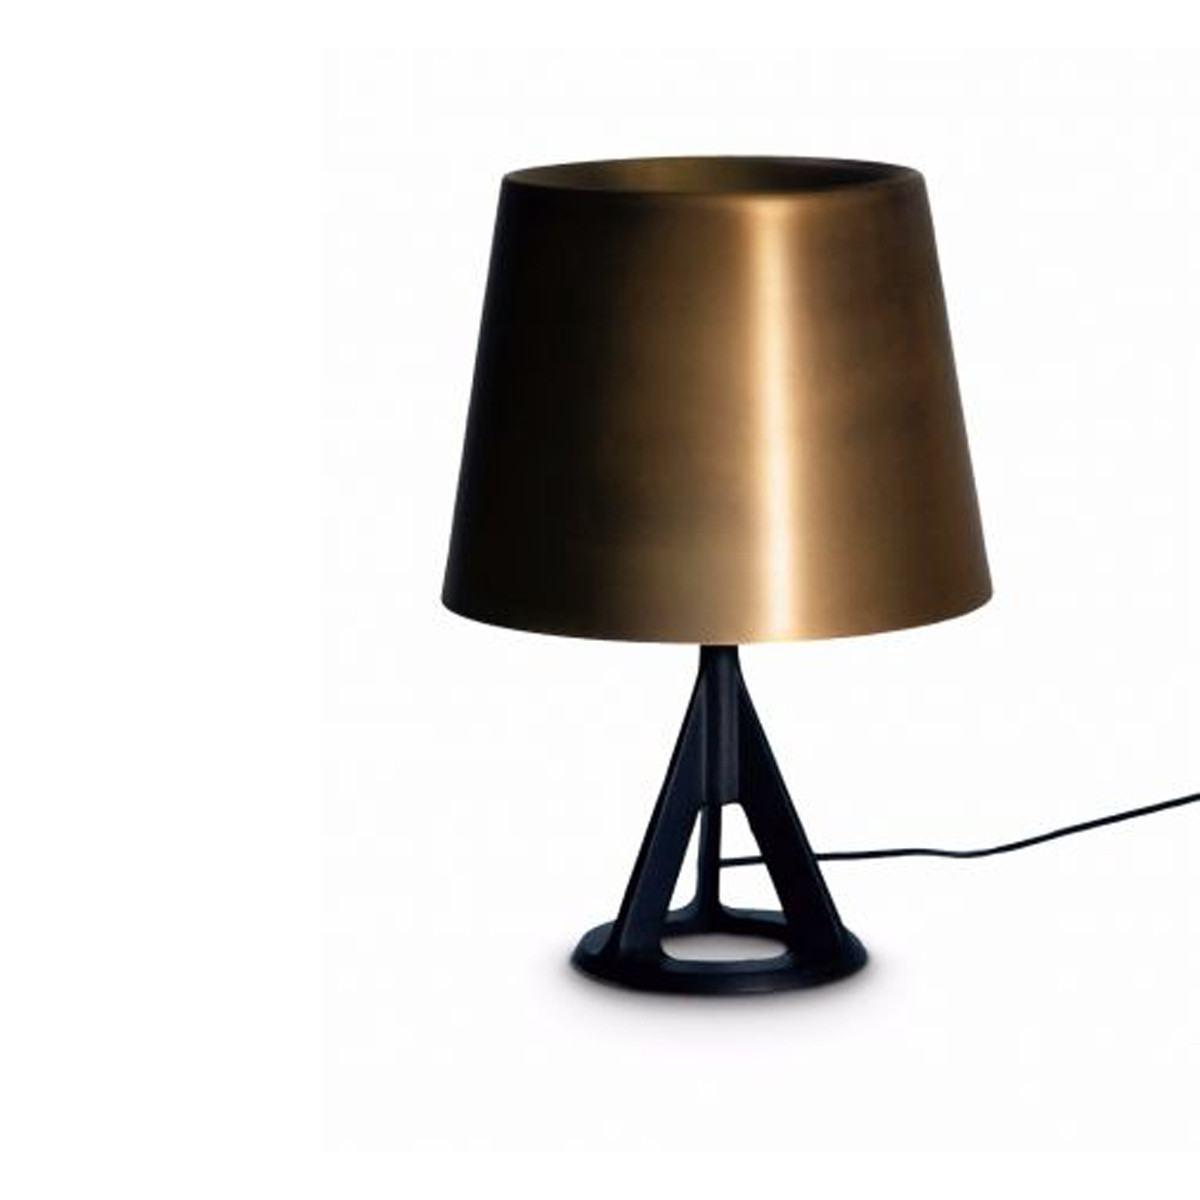 Tom Dixon Base Table Lamp